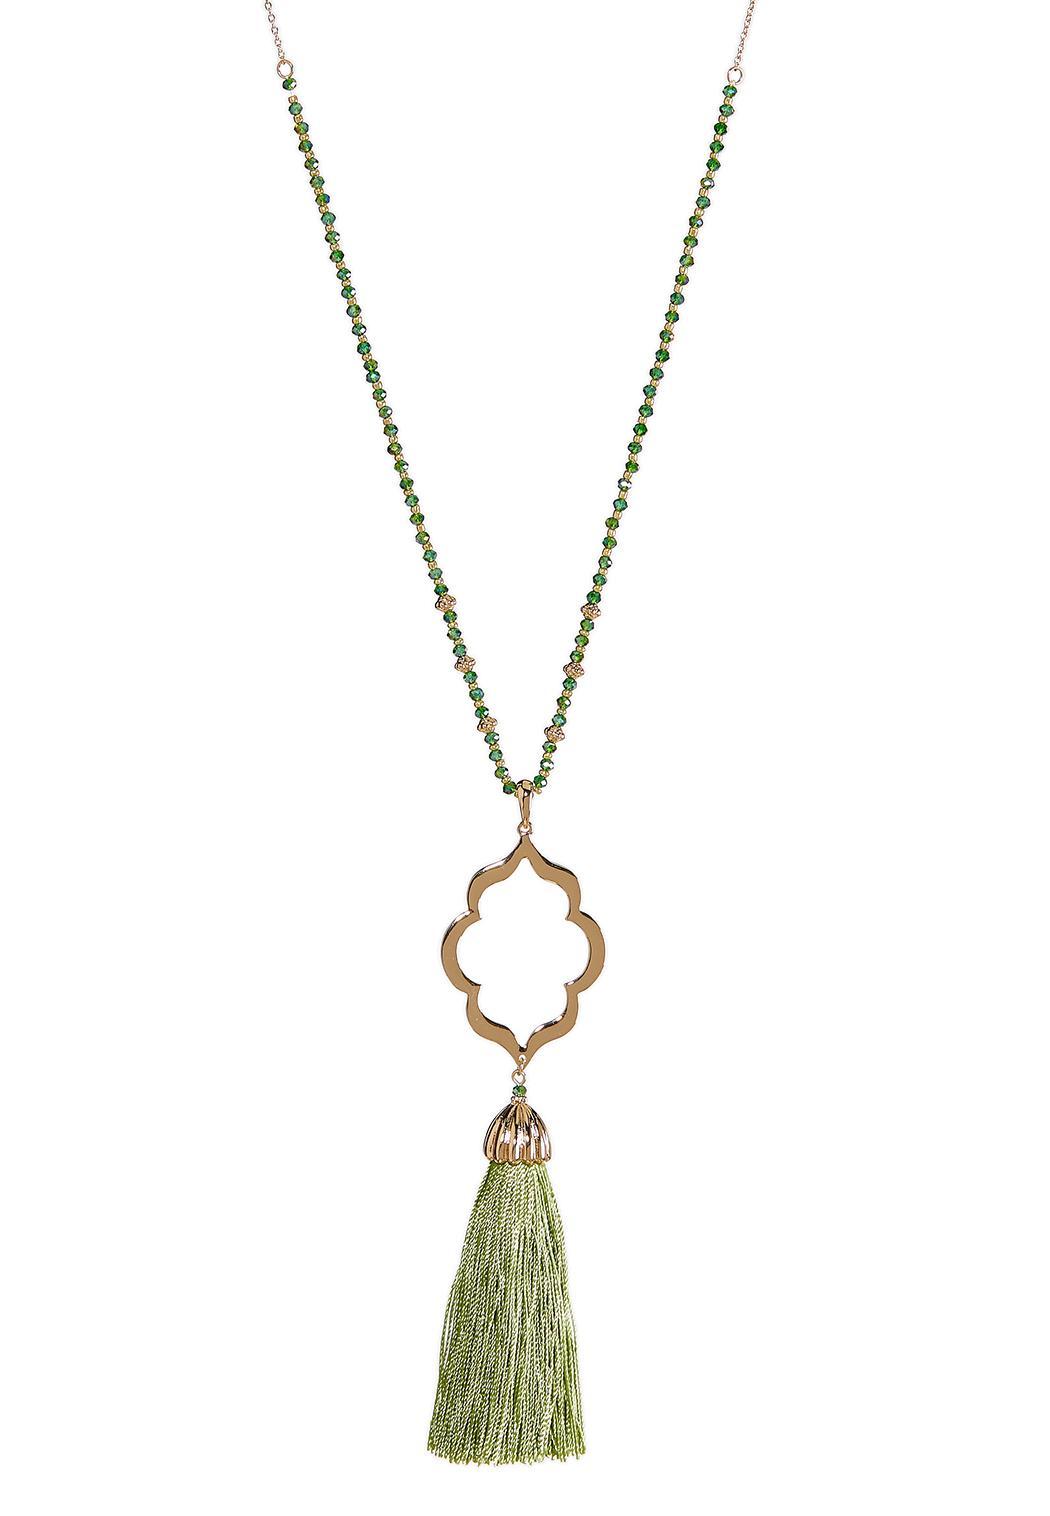 Moroccan Tassel Pendant Necklace